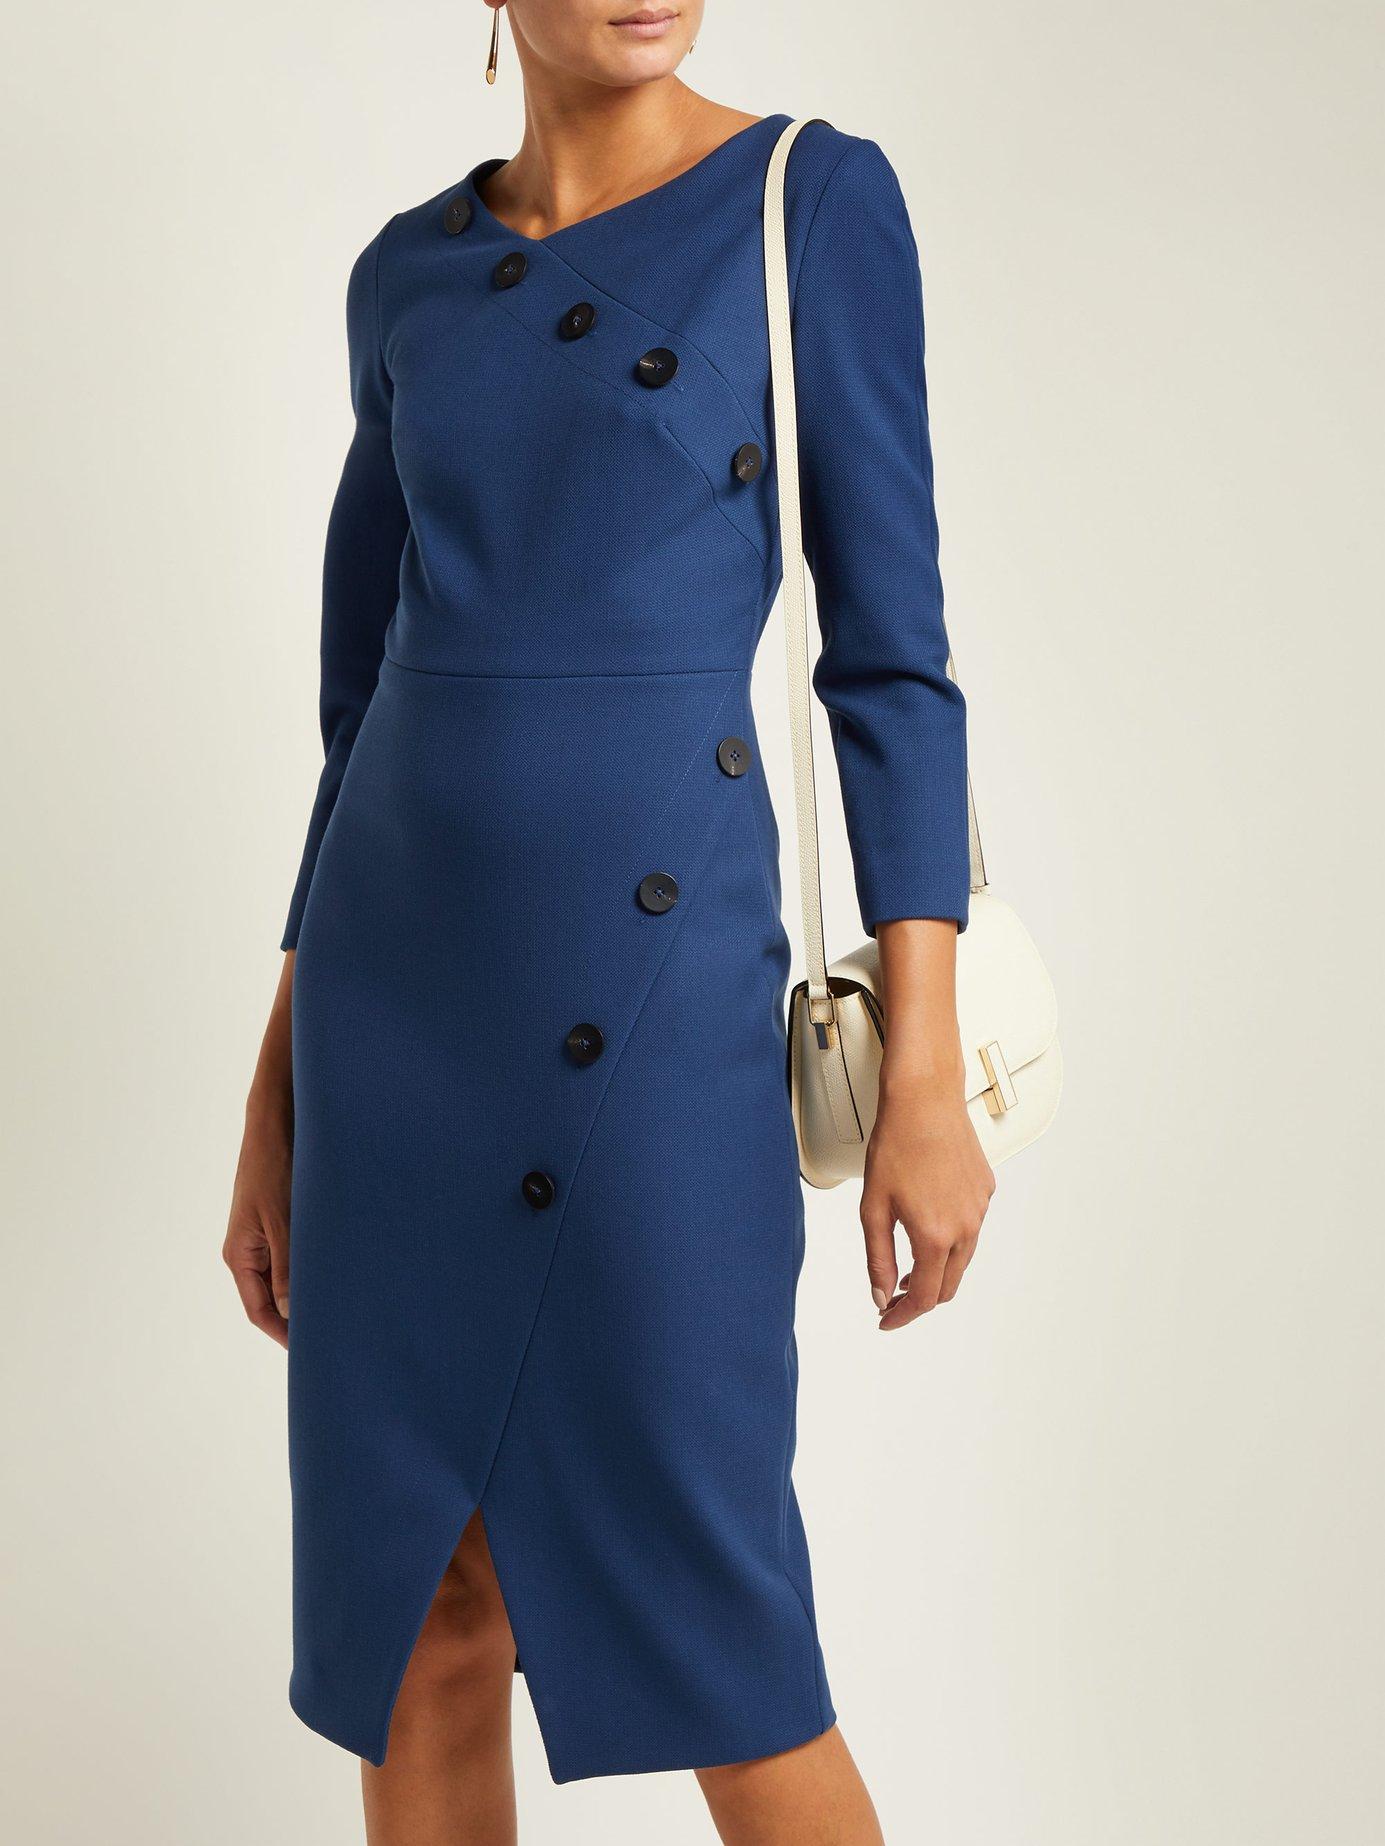 Buttoned ponte pencil dress by Cefinn